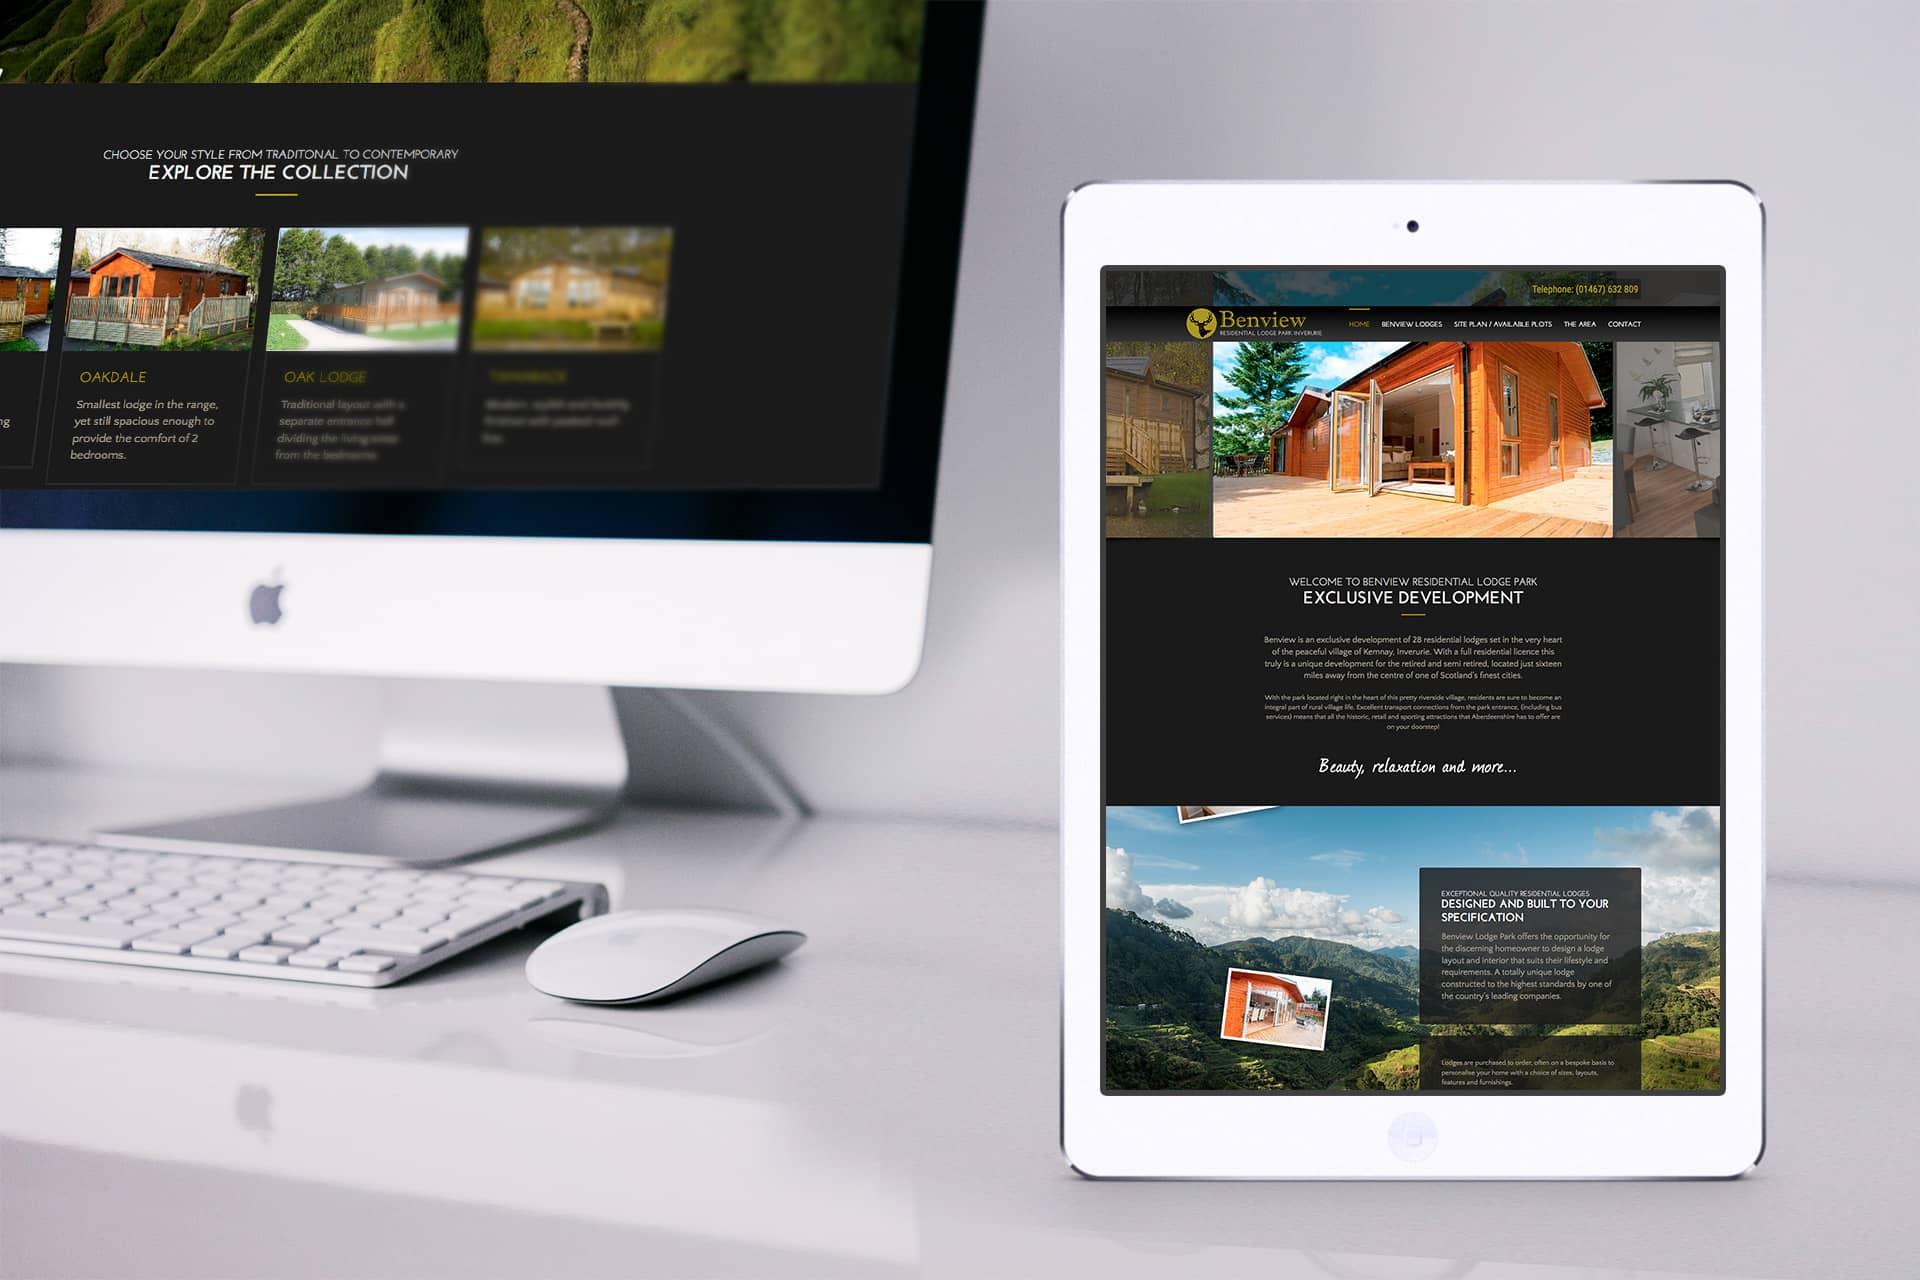 holiday park web design